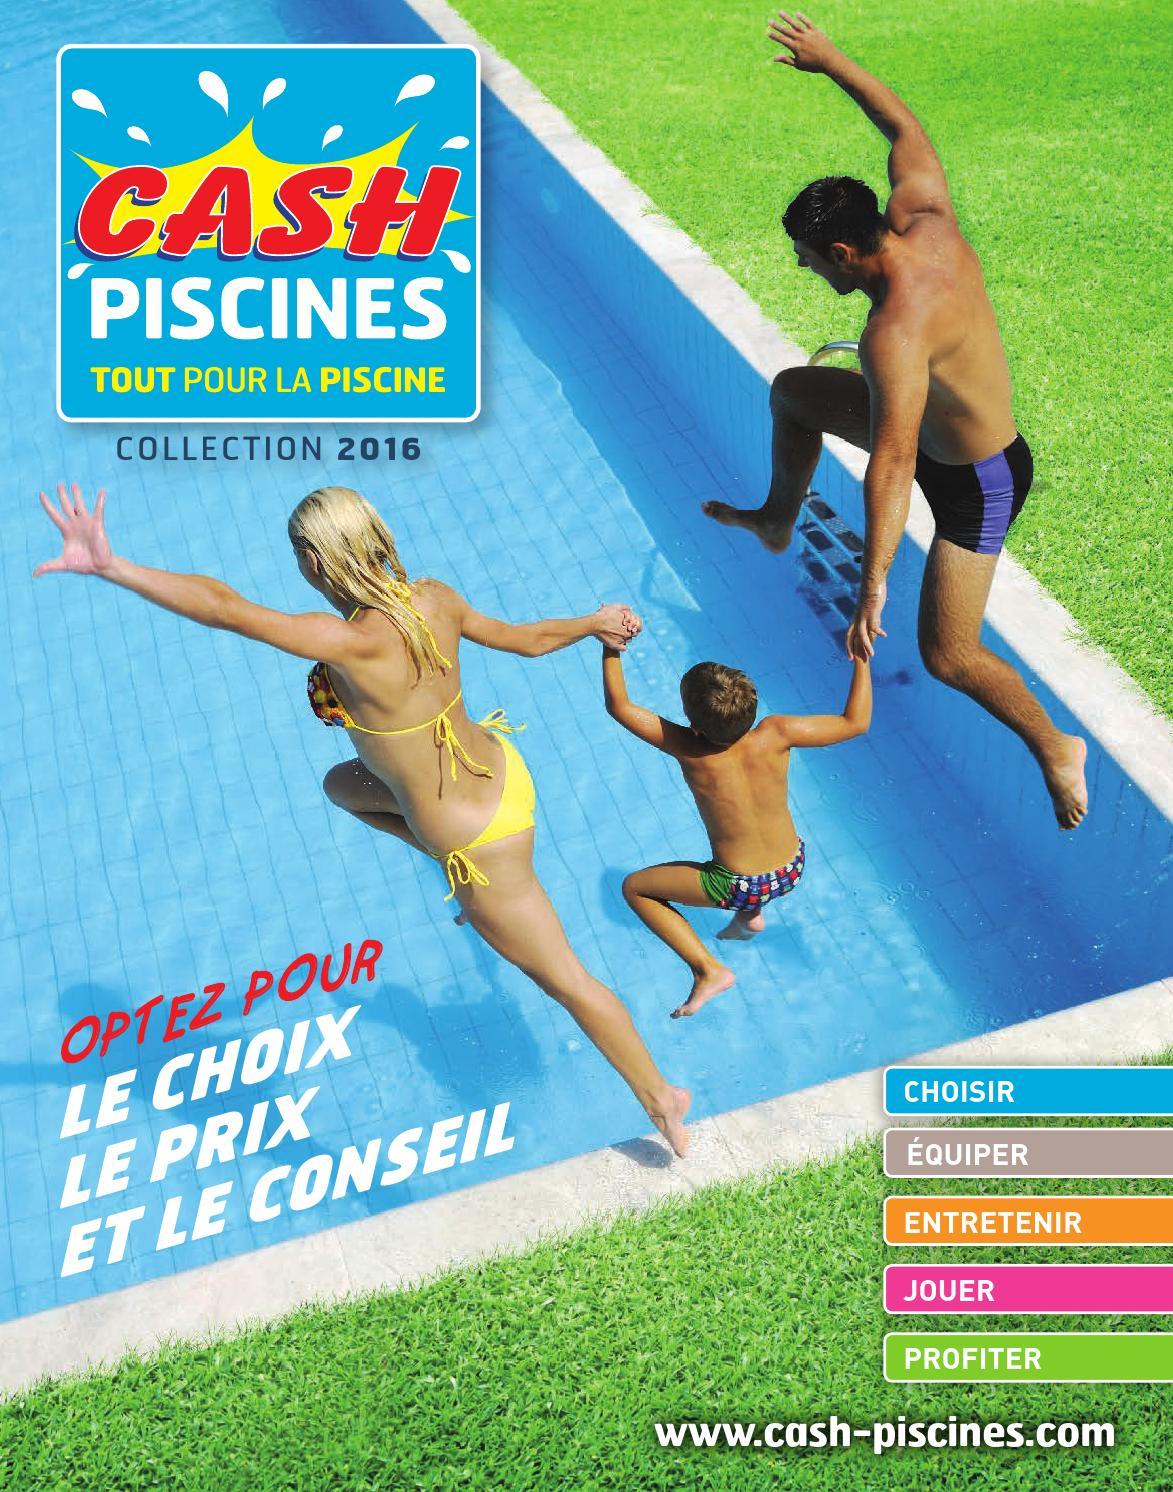 Cash Piscines 2016 By Octave Octave - Issuu avec Cash Piscine Brive